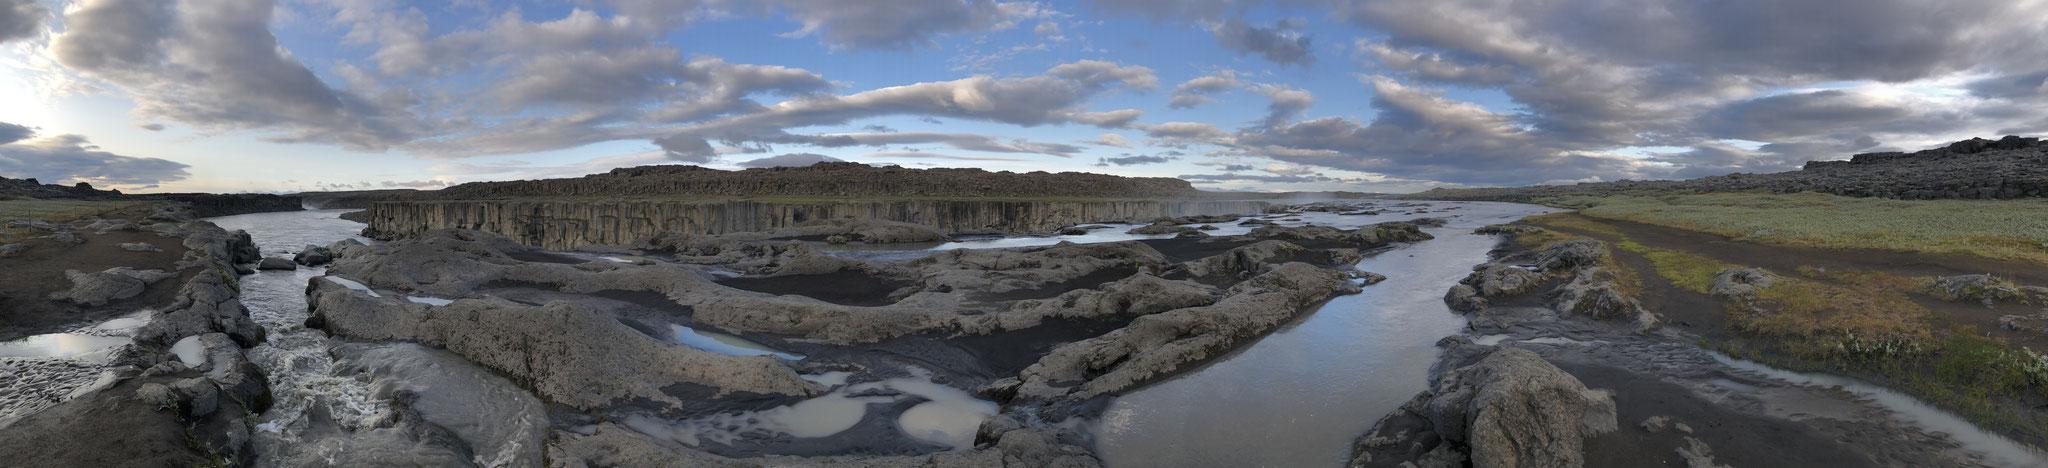 Detifoss and Selfoss Waterfalls, Iceland (July 2019)